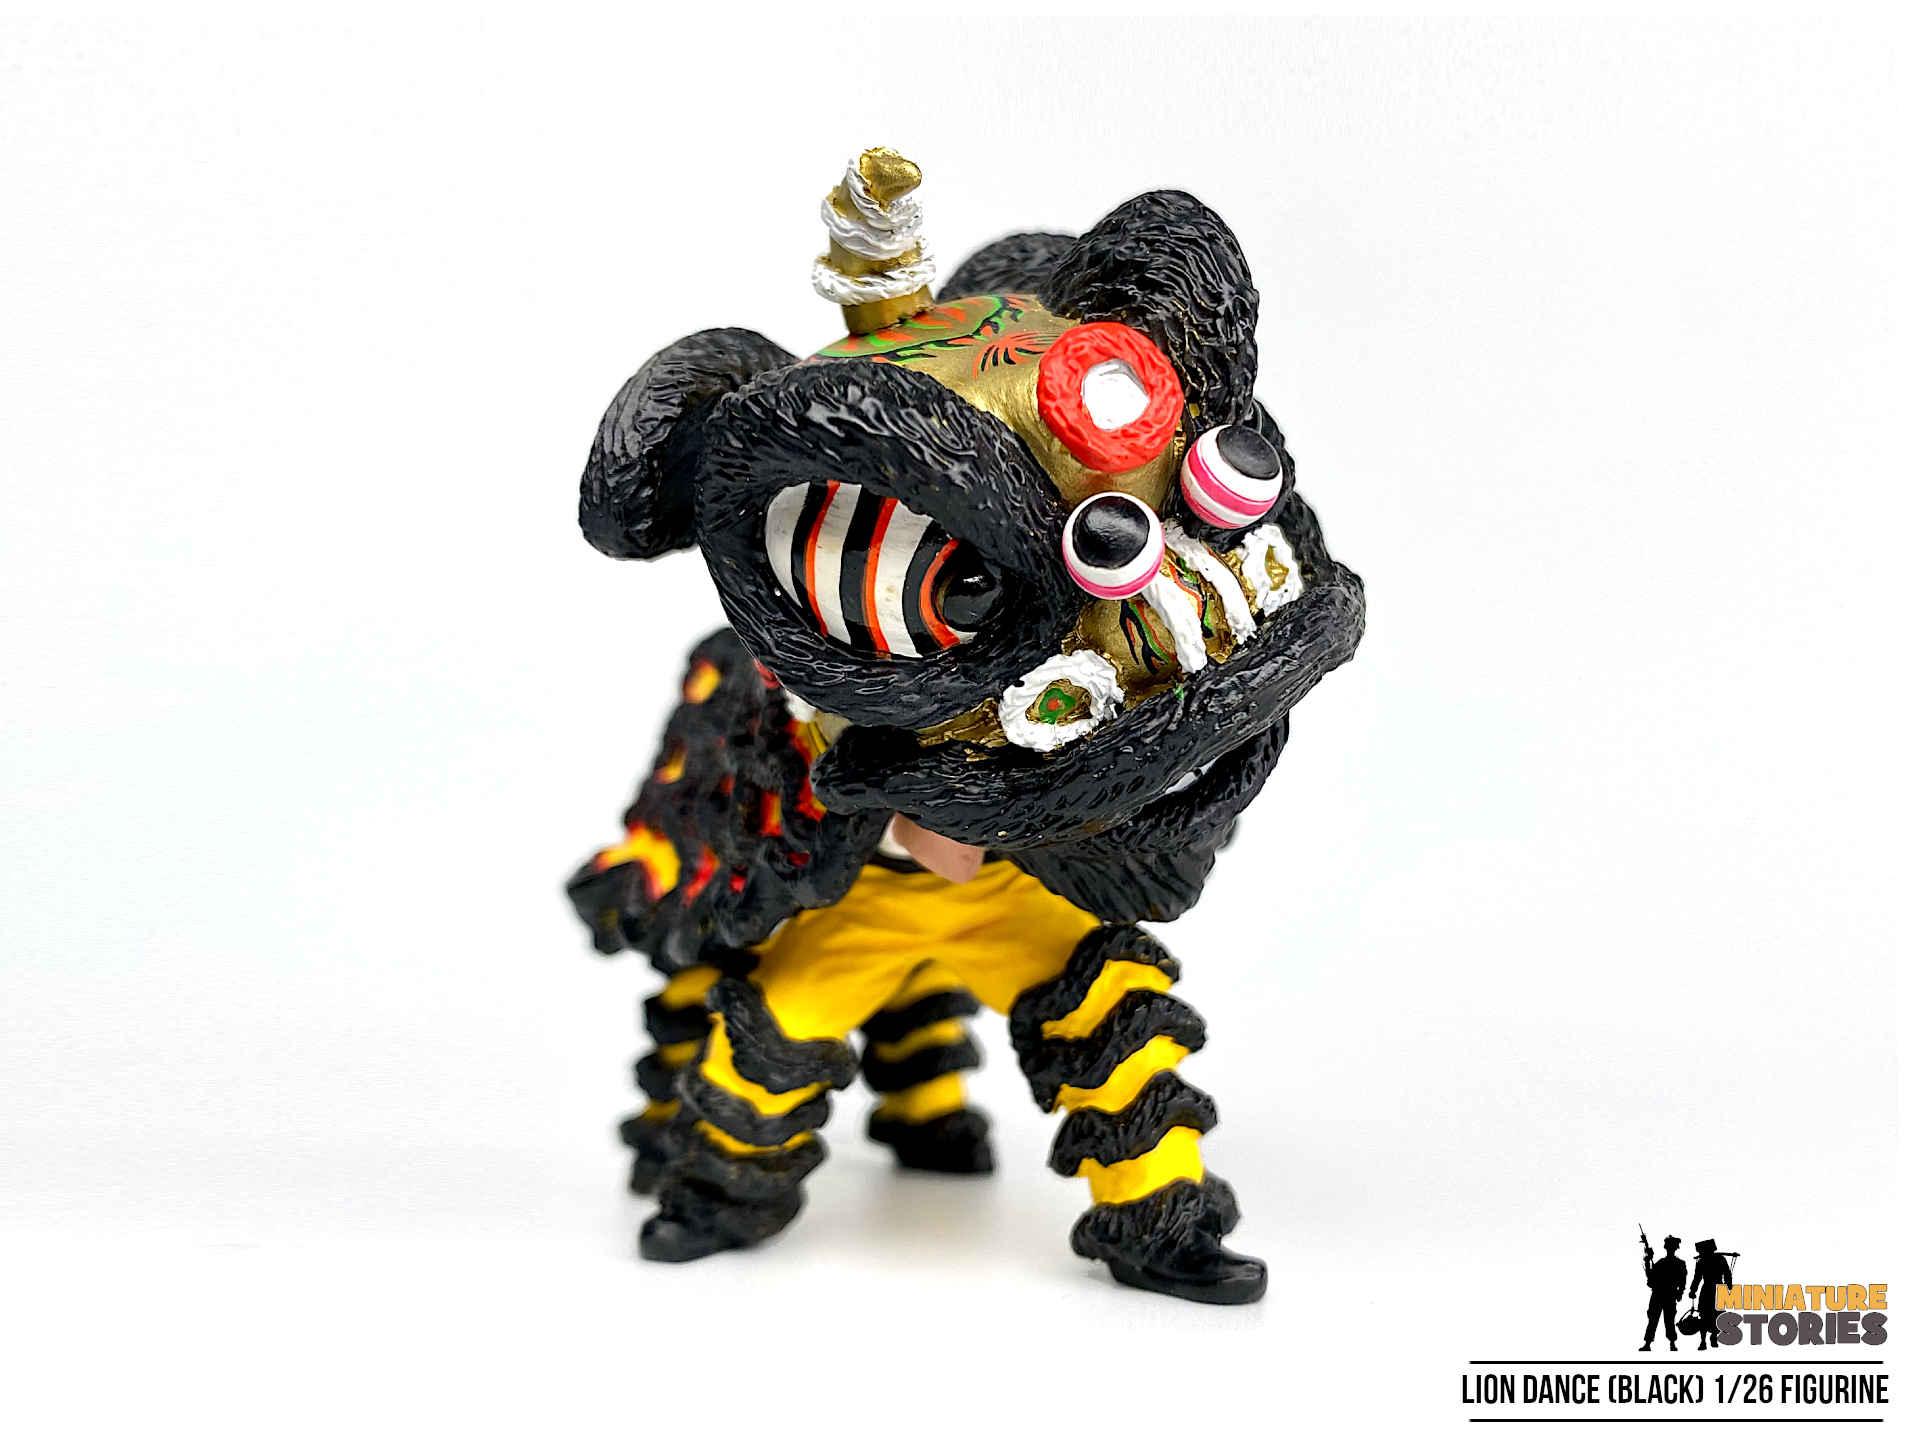 Miniature Lion Dance Figurine in Black (Close)